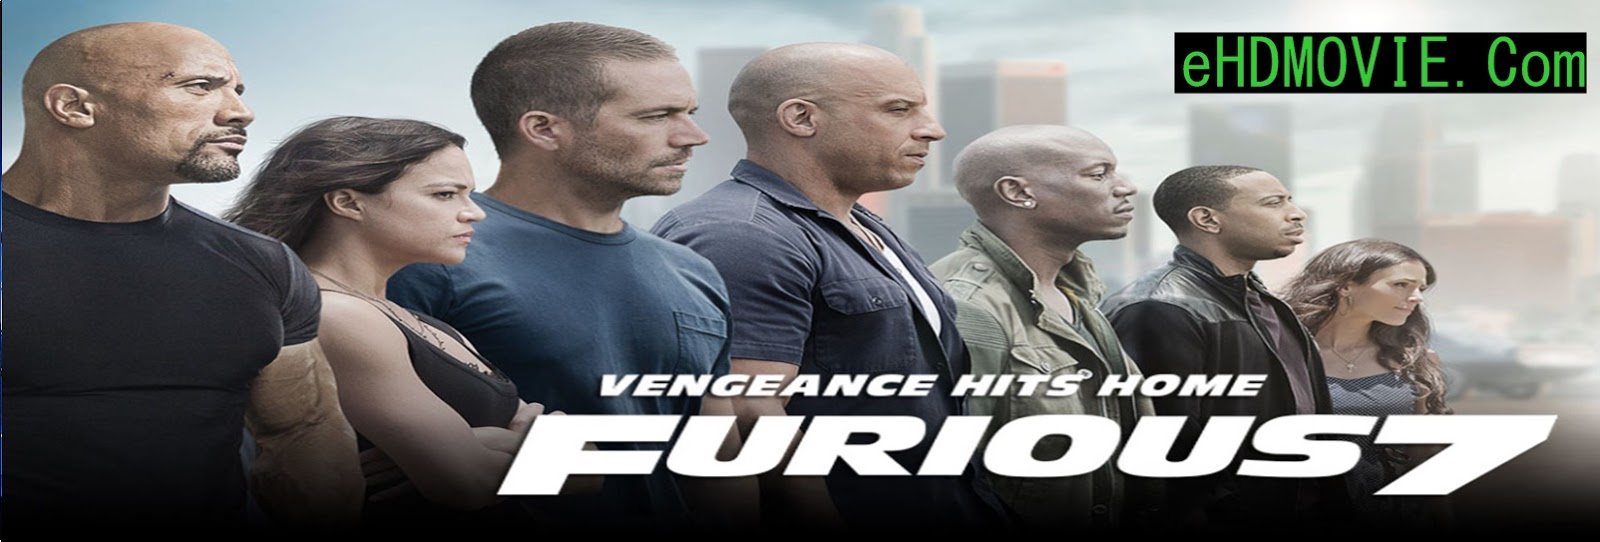 Furious 7 2015 Full Movie Dual Audio [Hindi – English] 1080p - 720p - 480p ORG BRRip 450MB - 1GB - 6.7GB ESubs Free Download